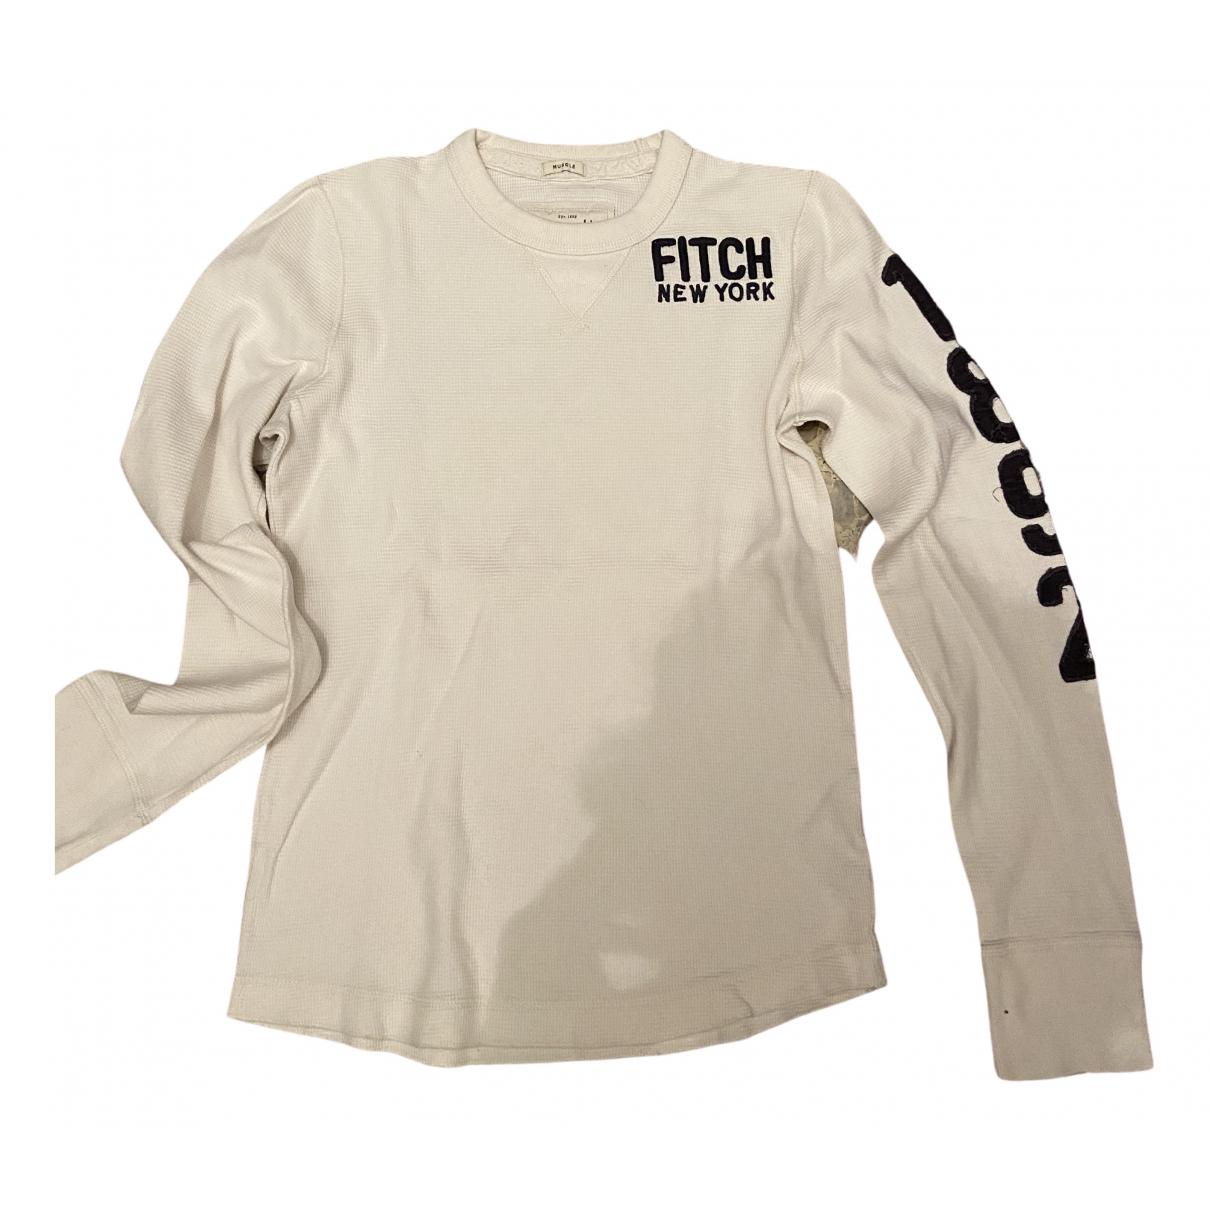 Abercrombie & Fitch \N White Cotton Knitwear & Sweatshirts for Men S International